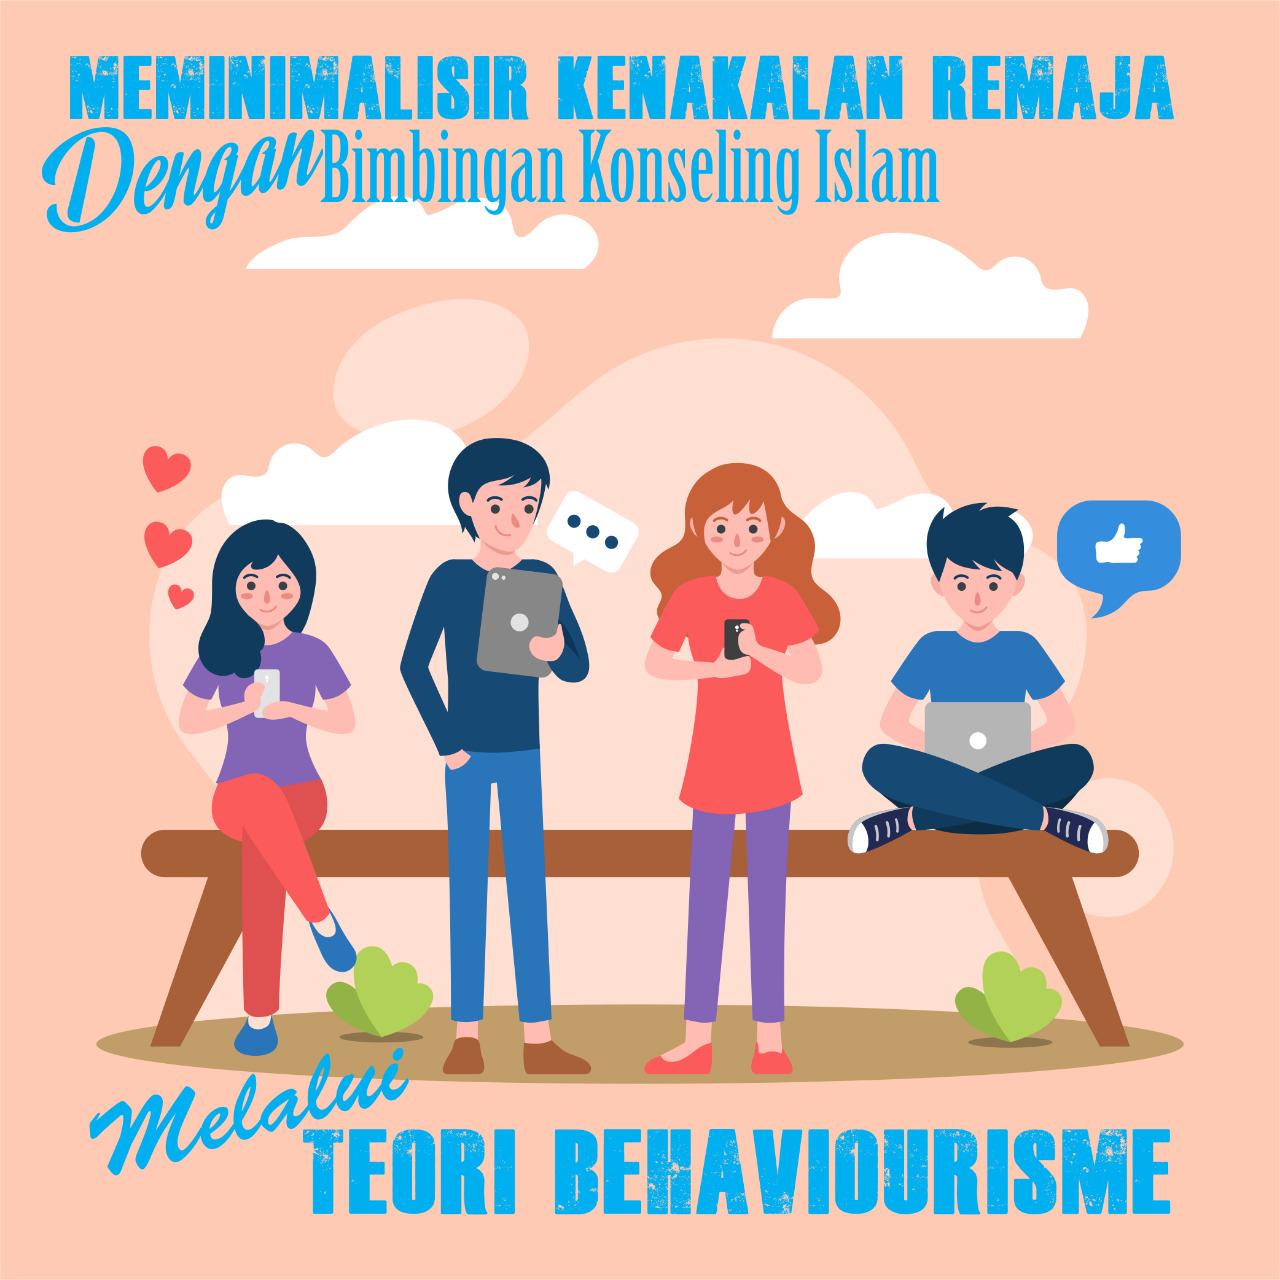 Meminimalisir Kenakalan Remaja dengan BKI Melalui Teori Behaviourisme